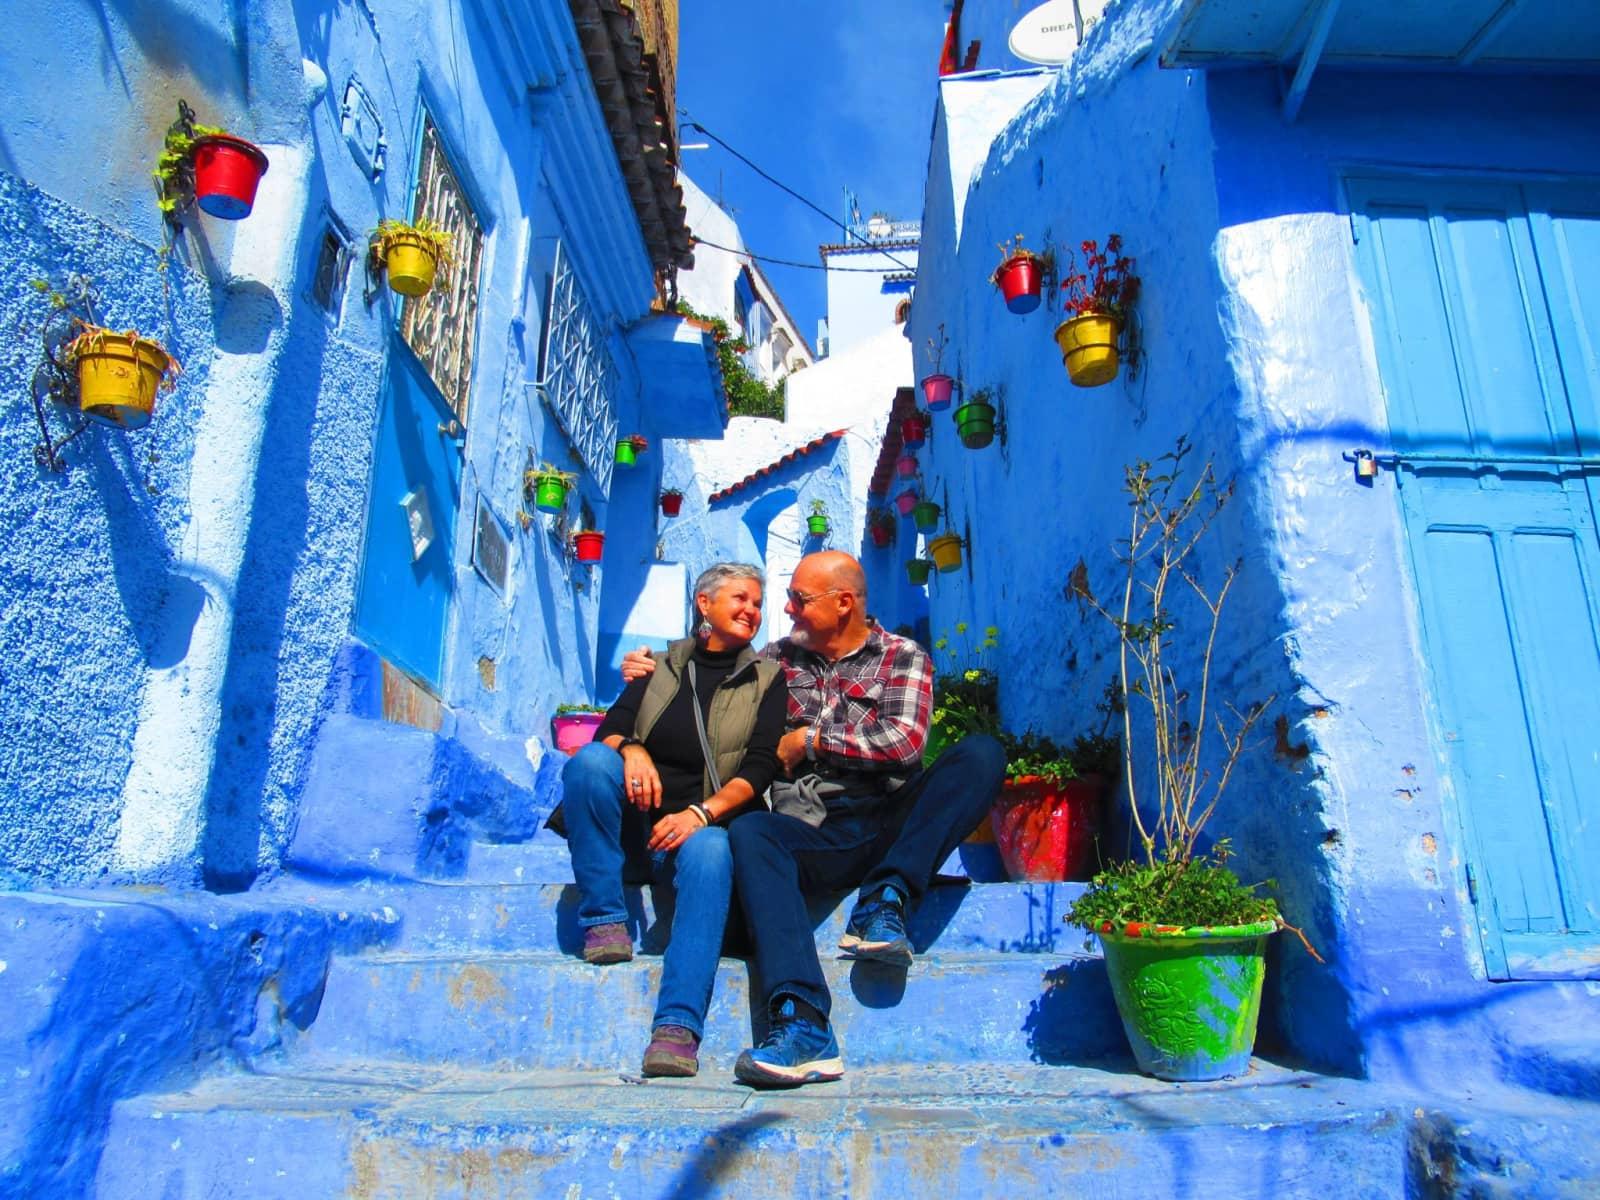 Susan & Gordon from Cairns, Queensland, Australia